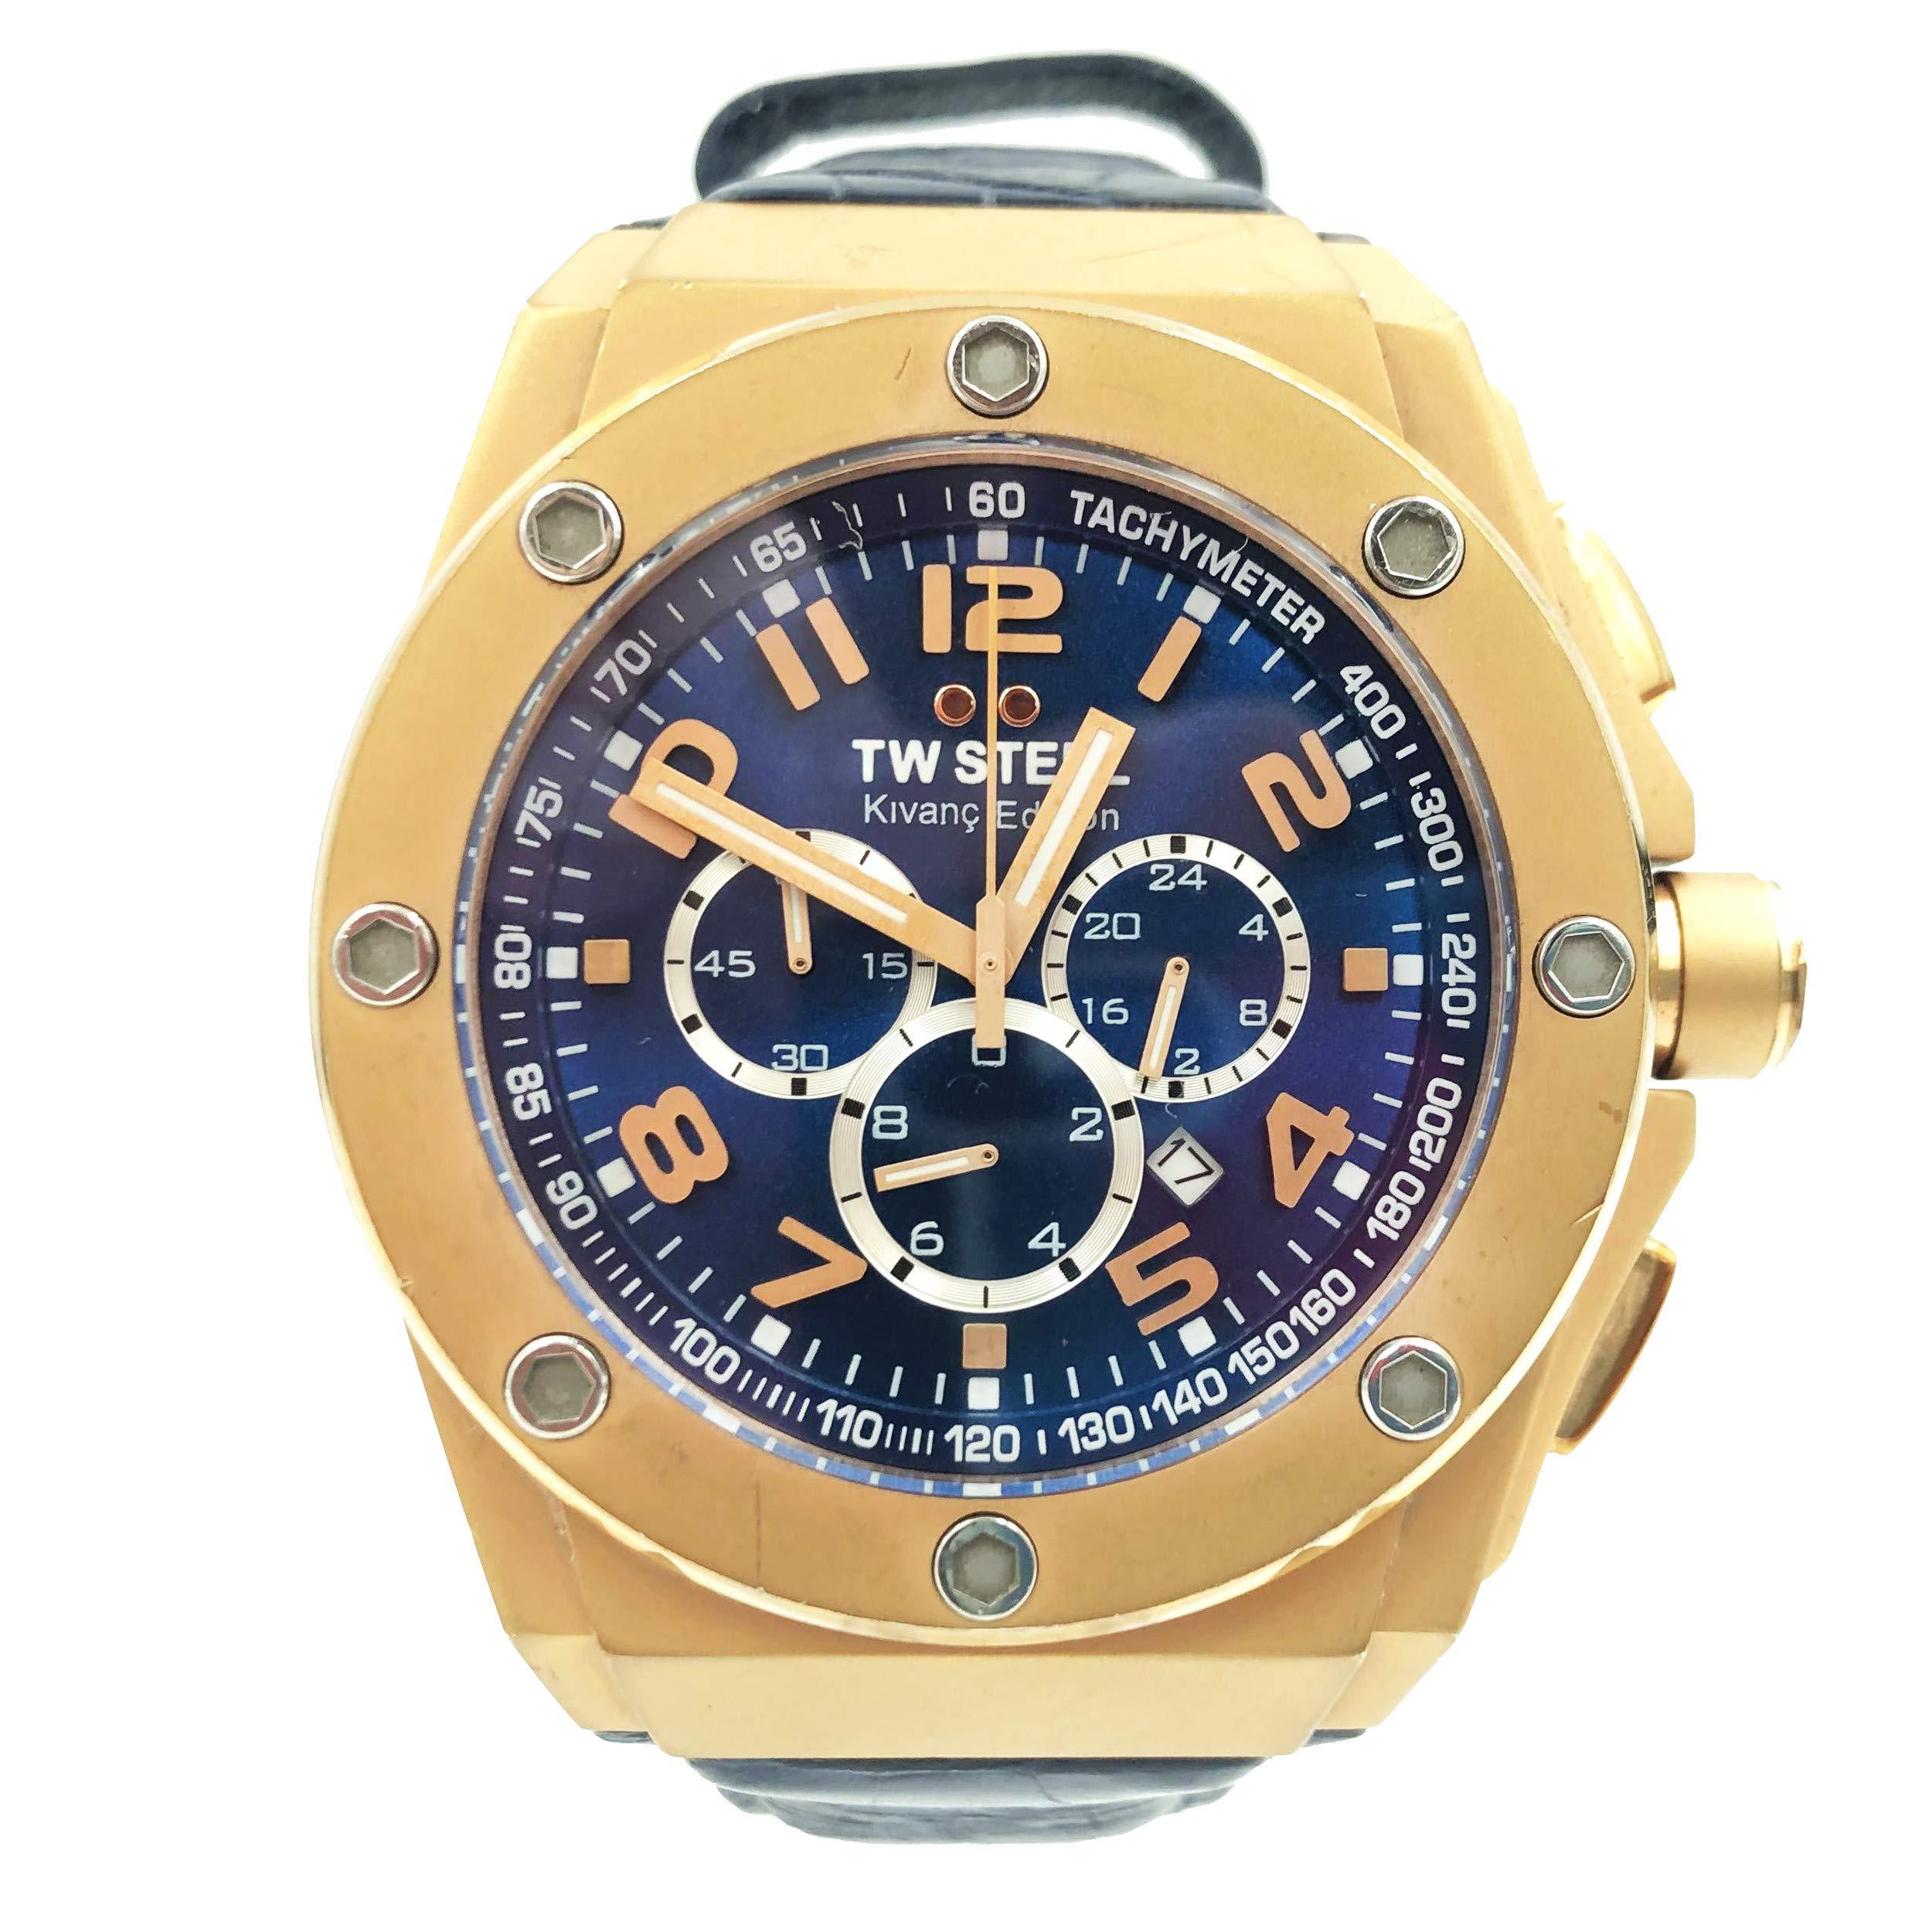 TW Steel CEO Quartz Male Watch CE4004 (Certified Pre-Owned) by TW Steel (Image #1)